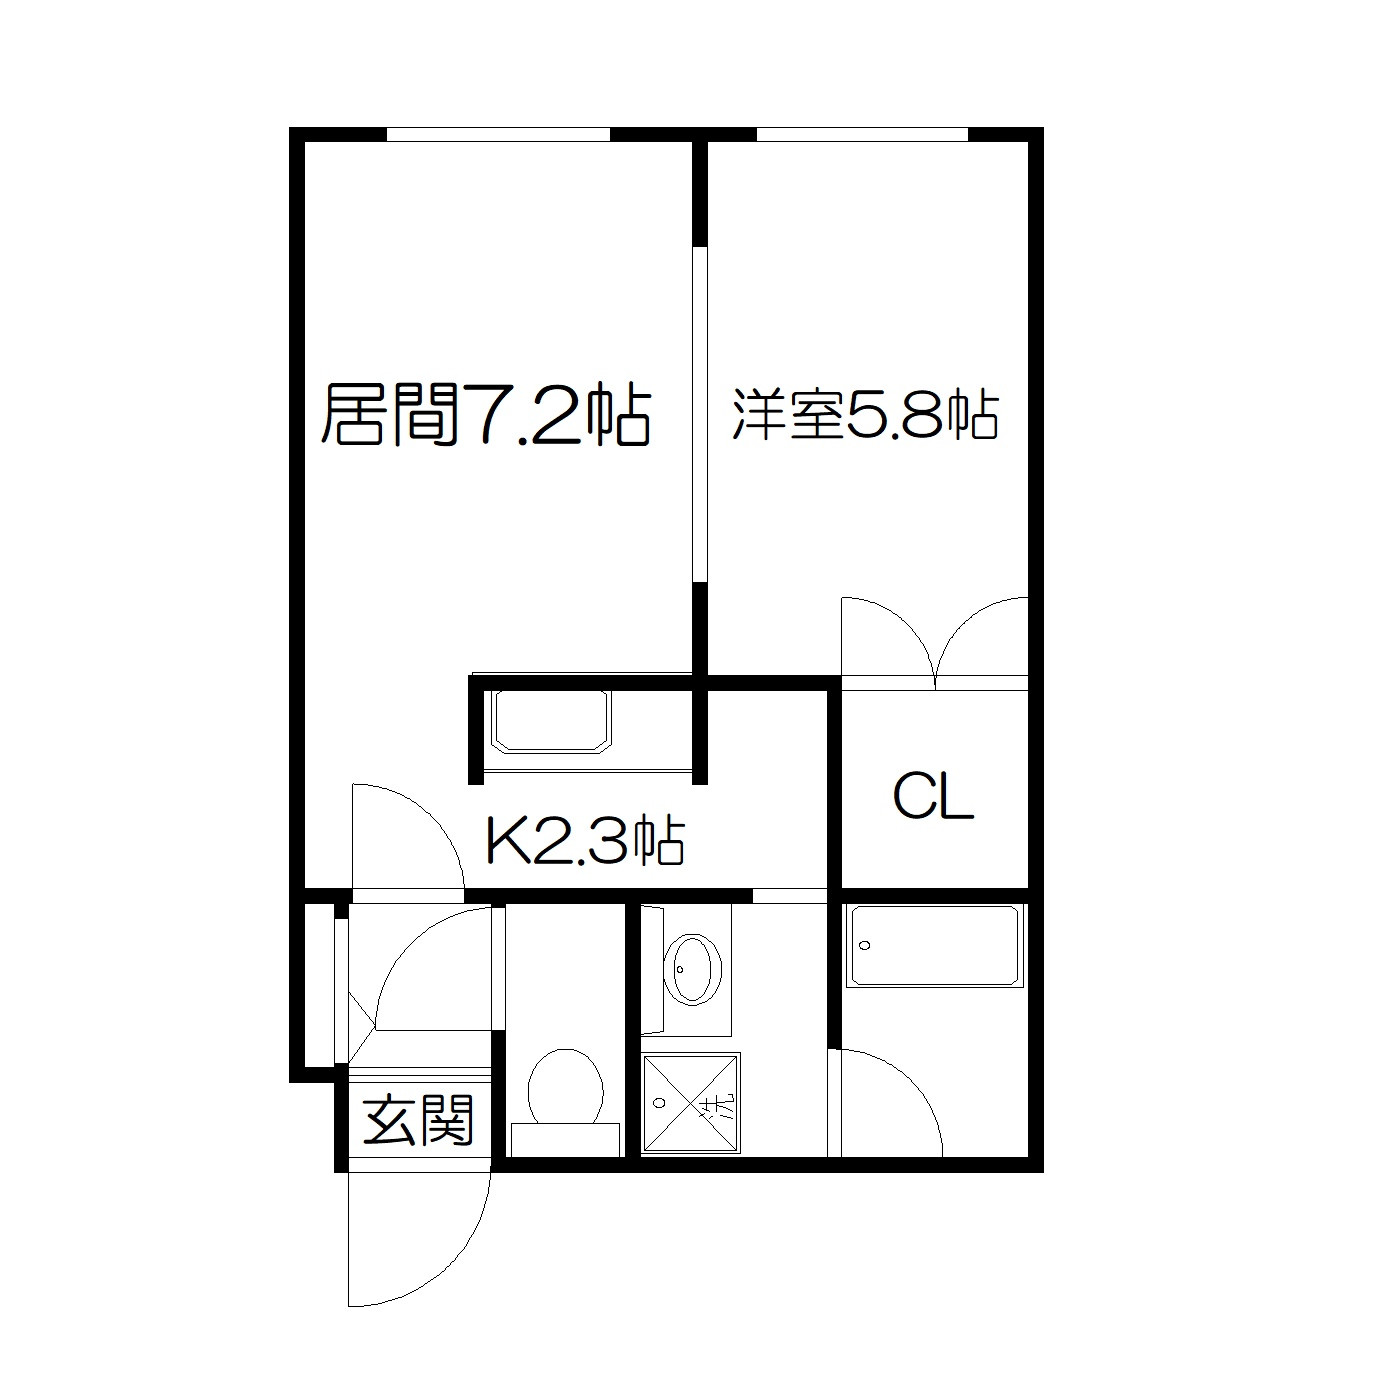 POROKARI菊水駅前/オートロック/北海道がんセンター徒歩3分